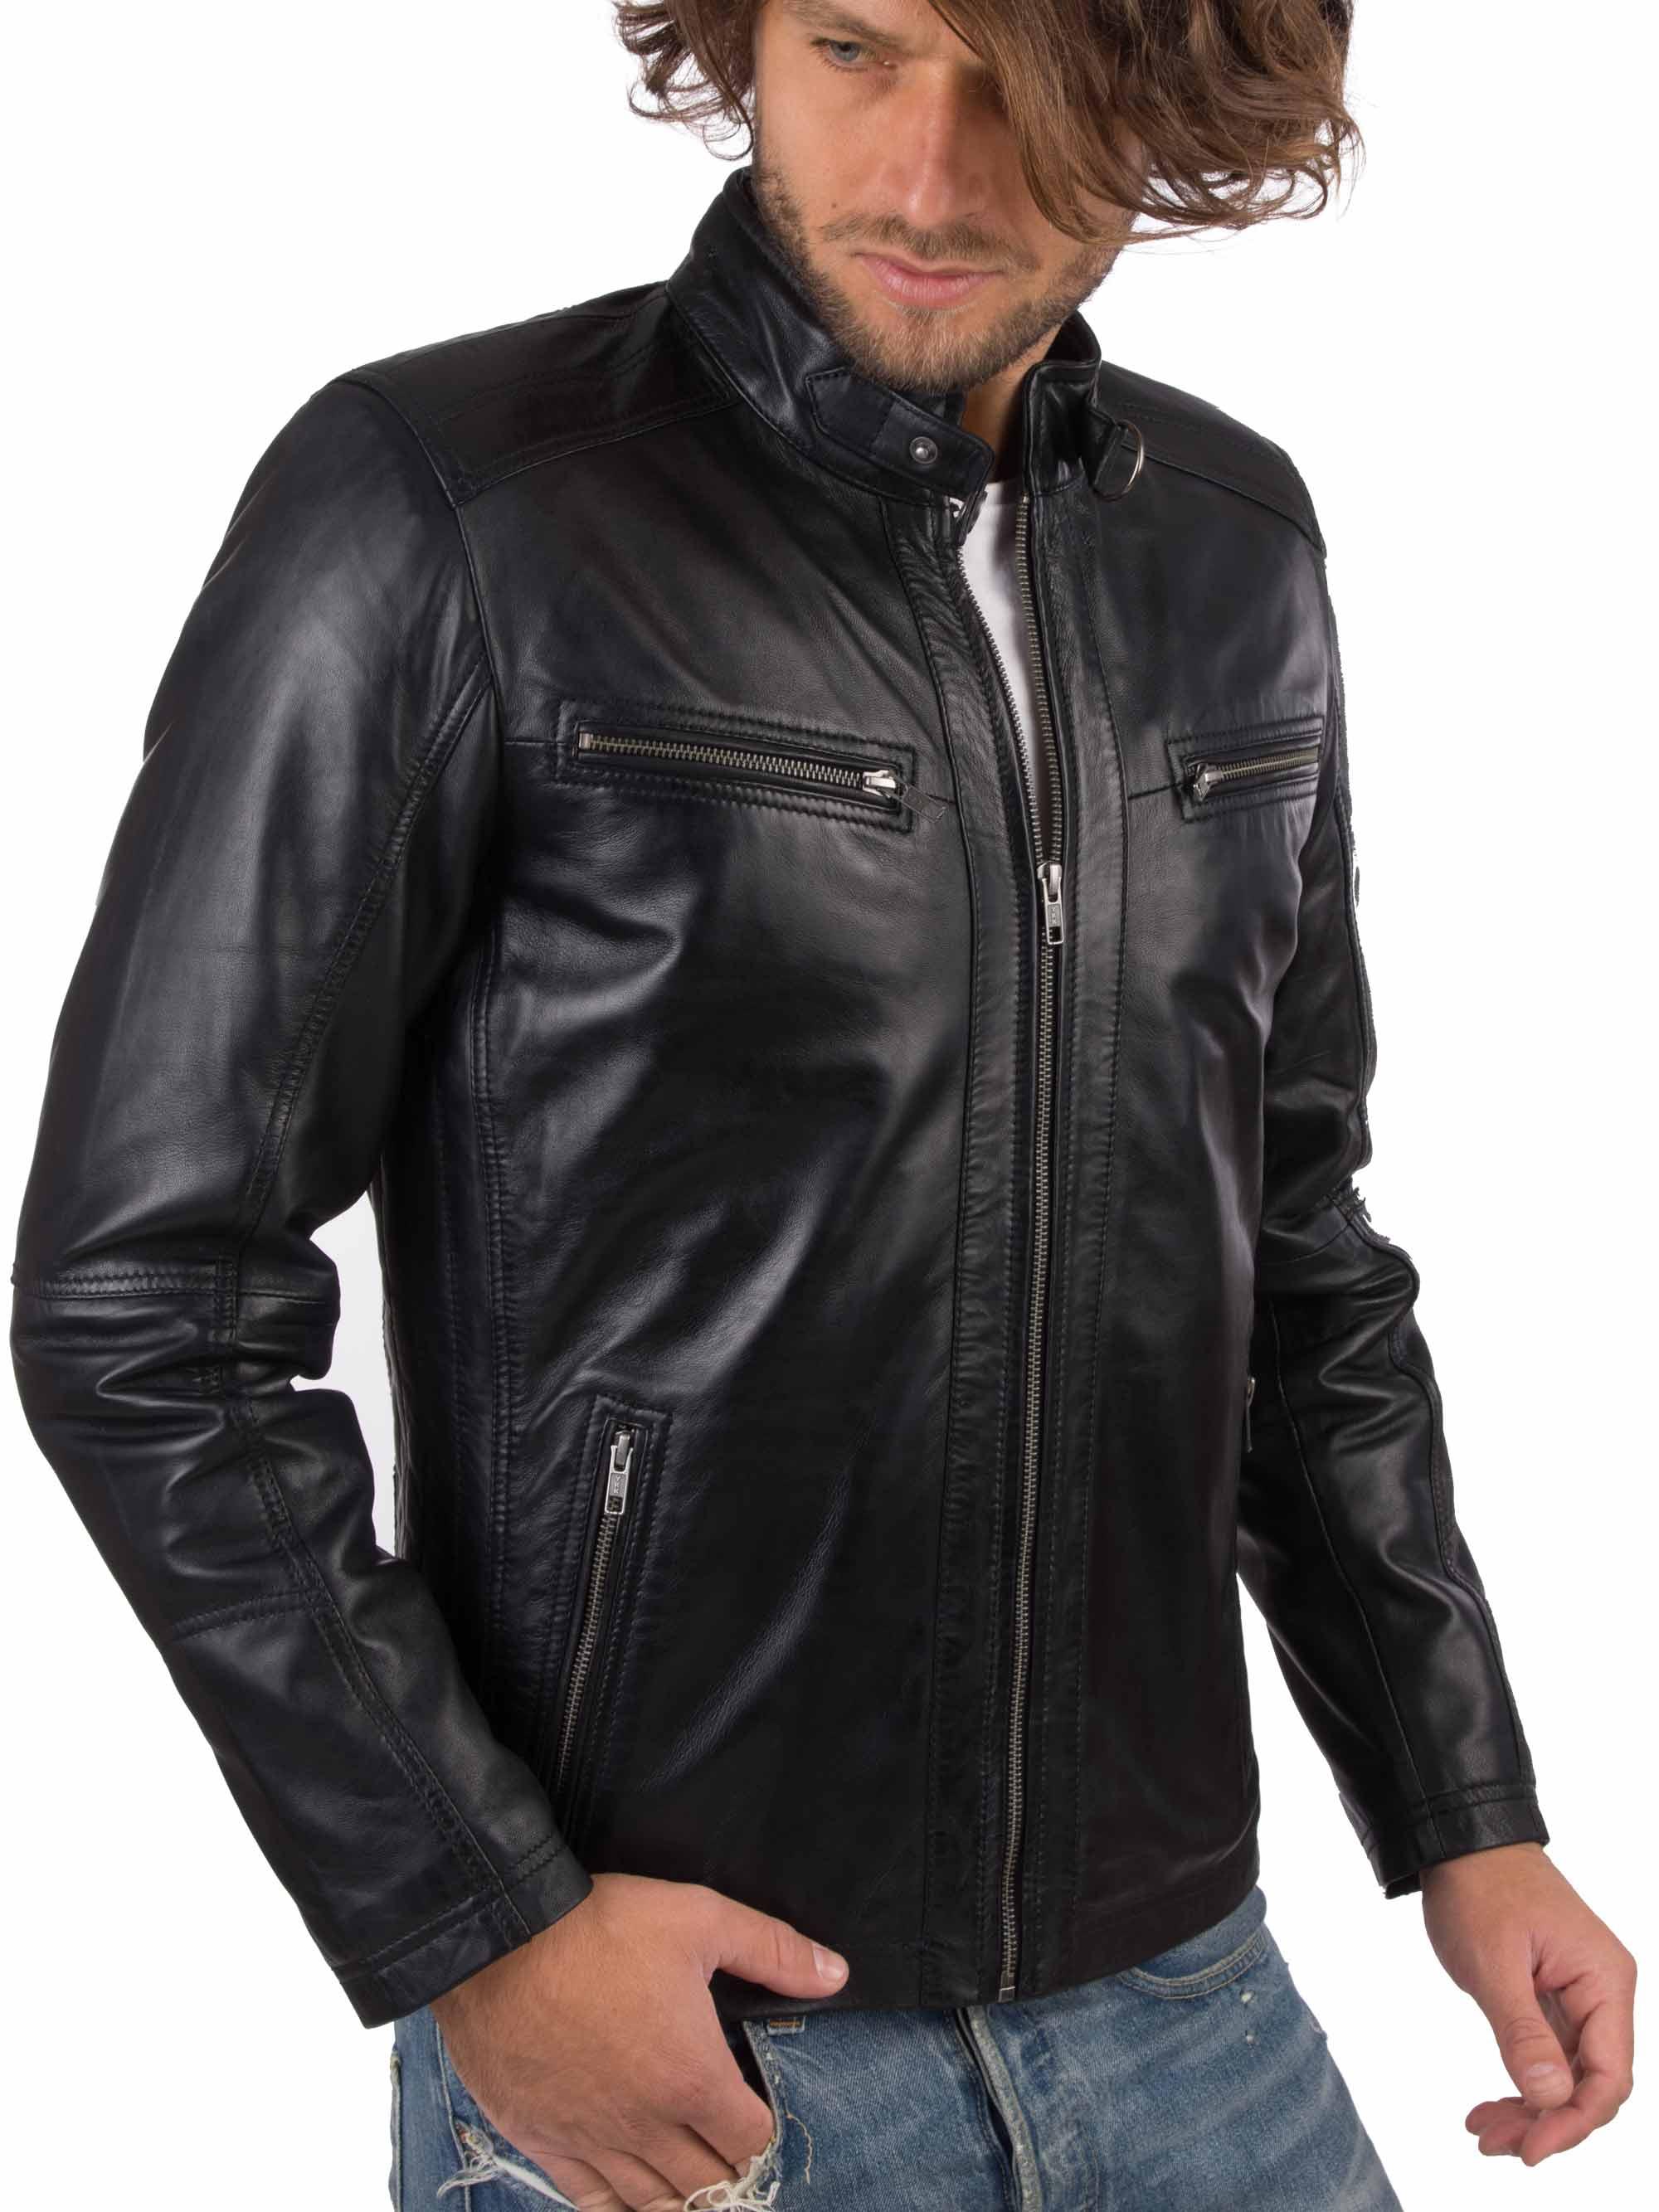 Hbefd9f33eabb43c399358ddf1d83a7bbg VAINAS European Brand Mens Genuine Leather jacket for men Winter Real sheep leather jacket Motorcycle jackets Biker jackets Alfa